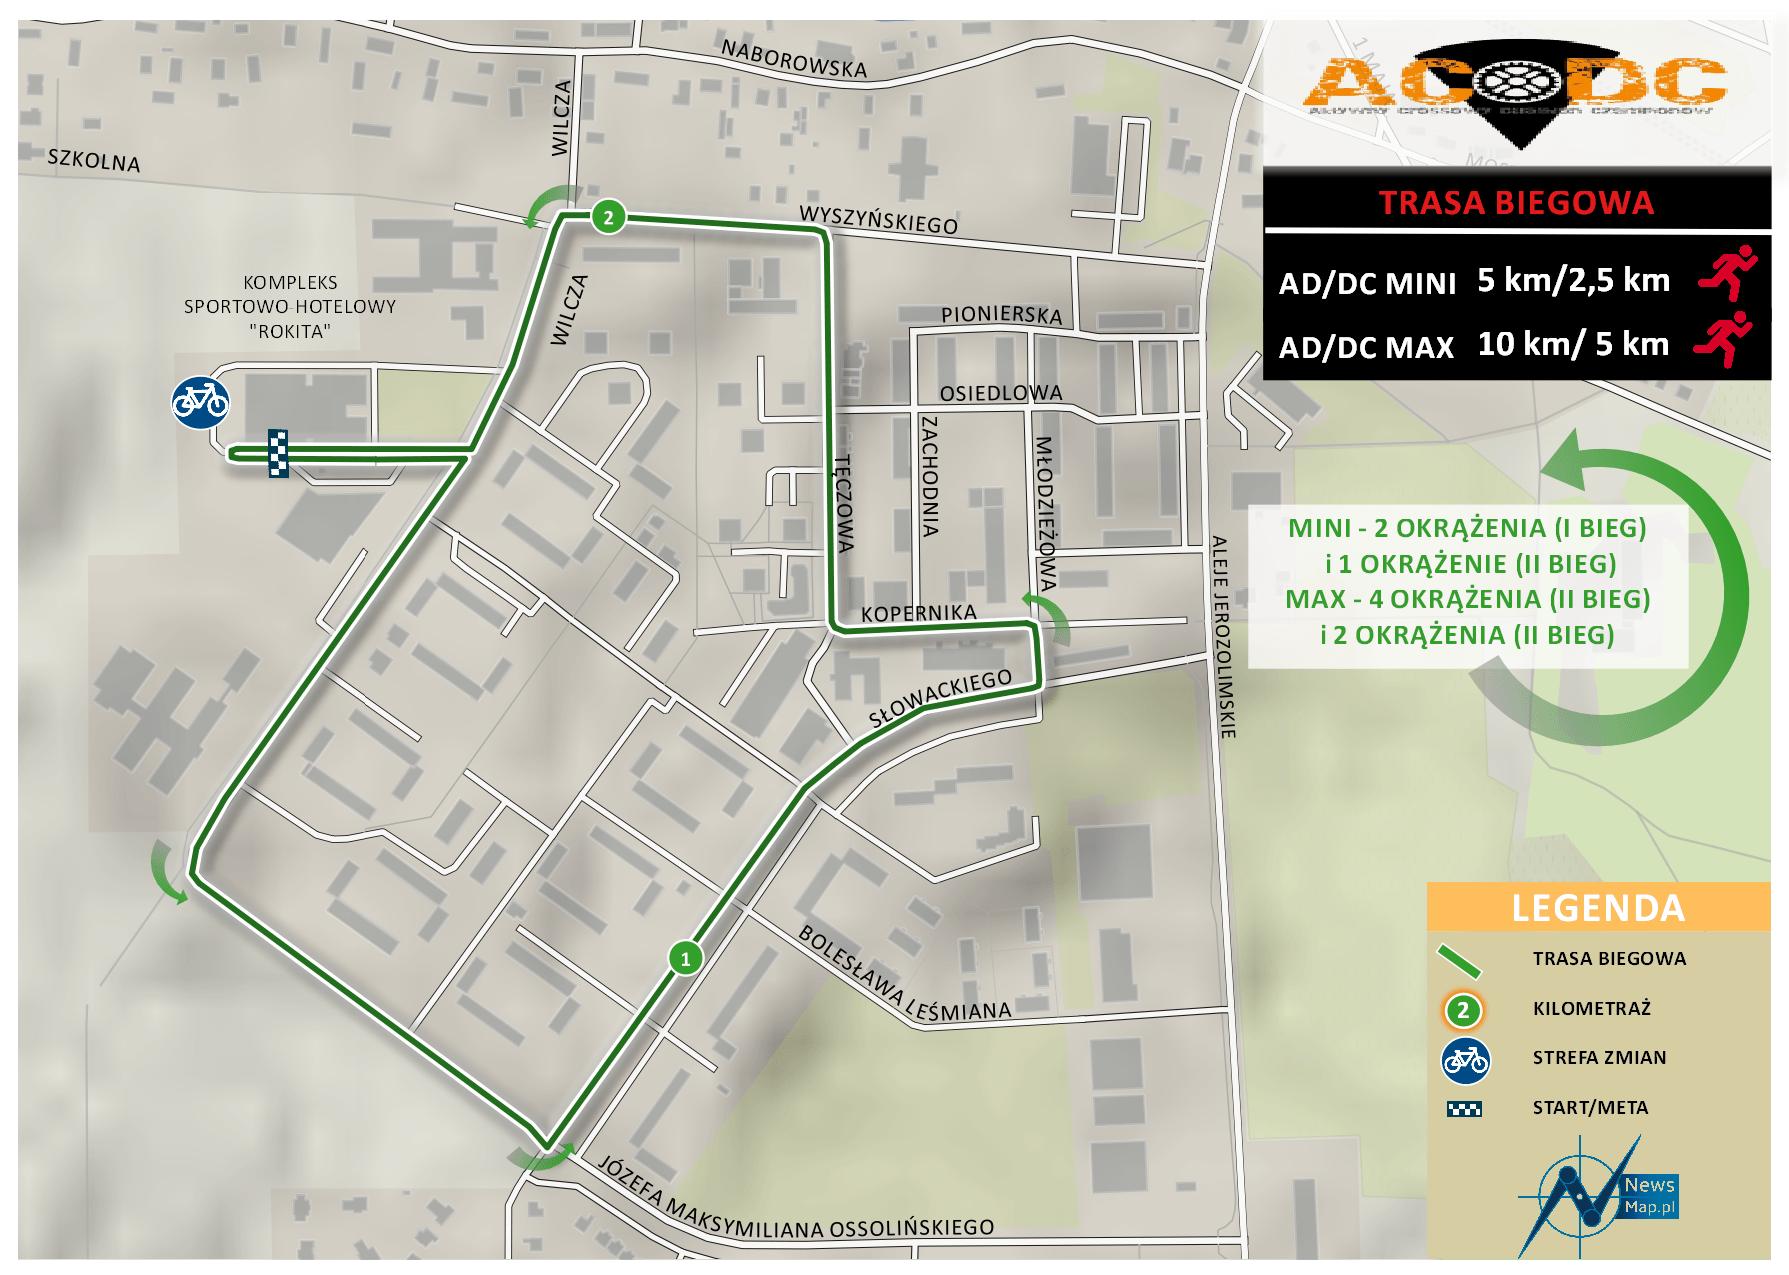 Duathlon AD;DC - trasa biegowa (mapa on-line)